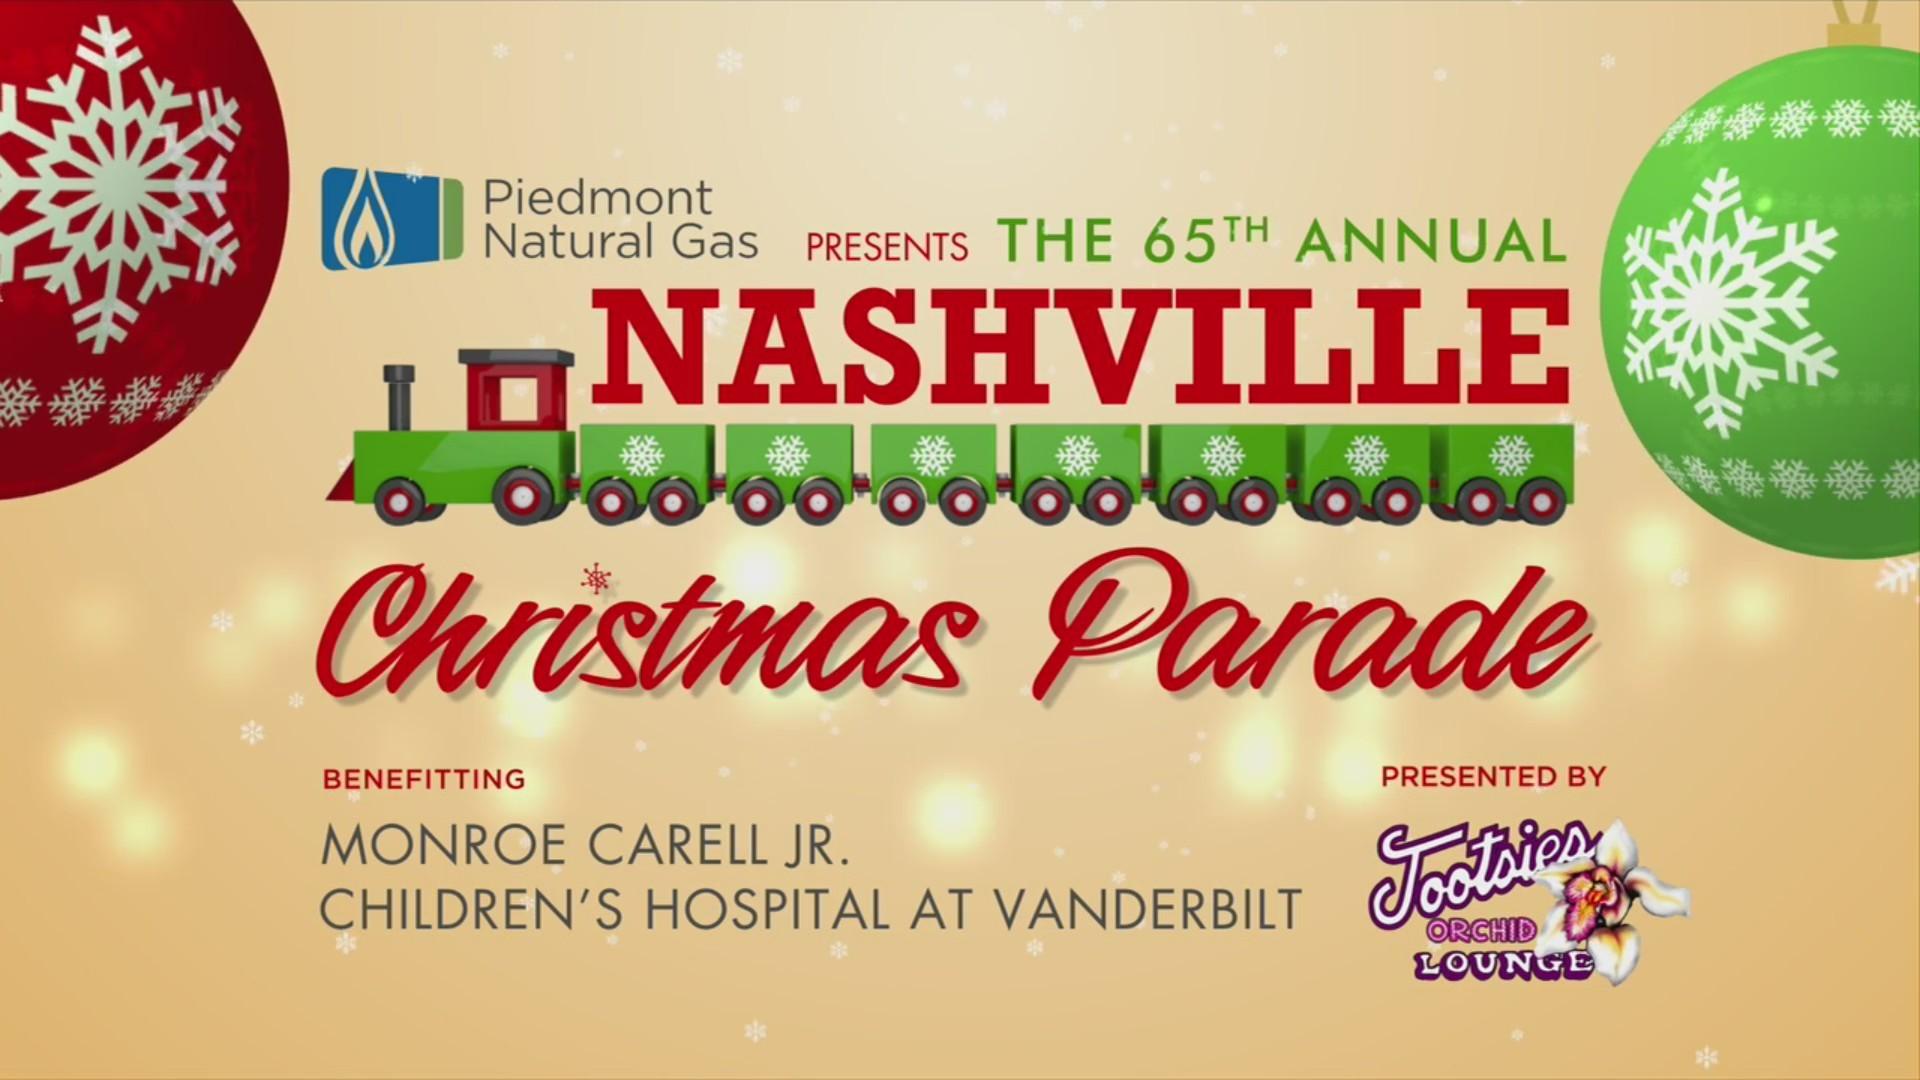 Nashville_Christmas_Parade_2018_0_20181206220717